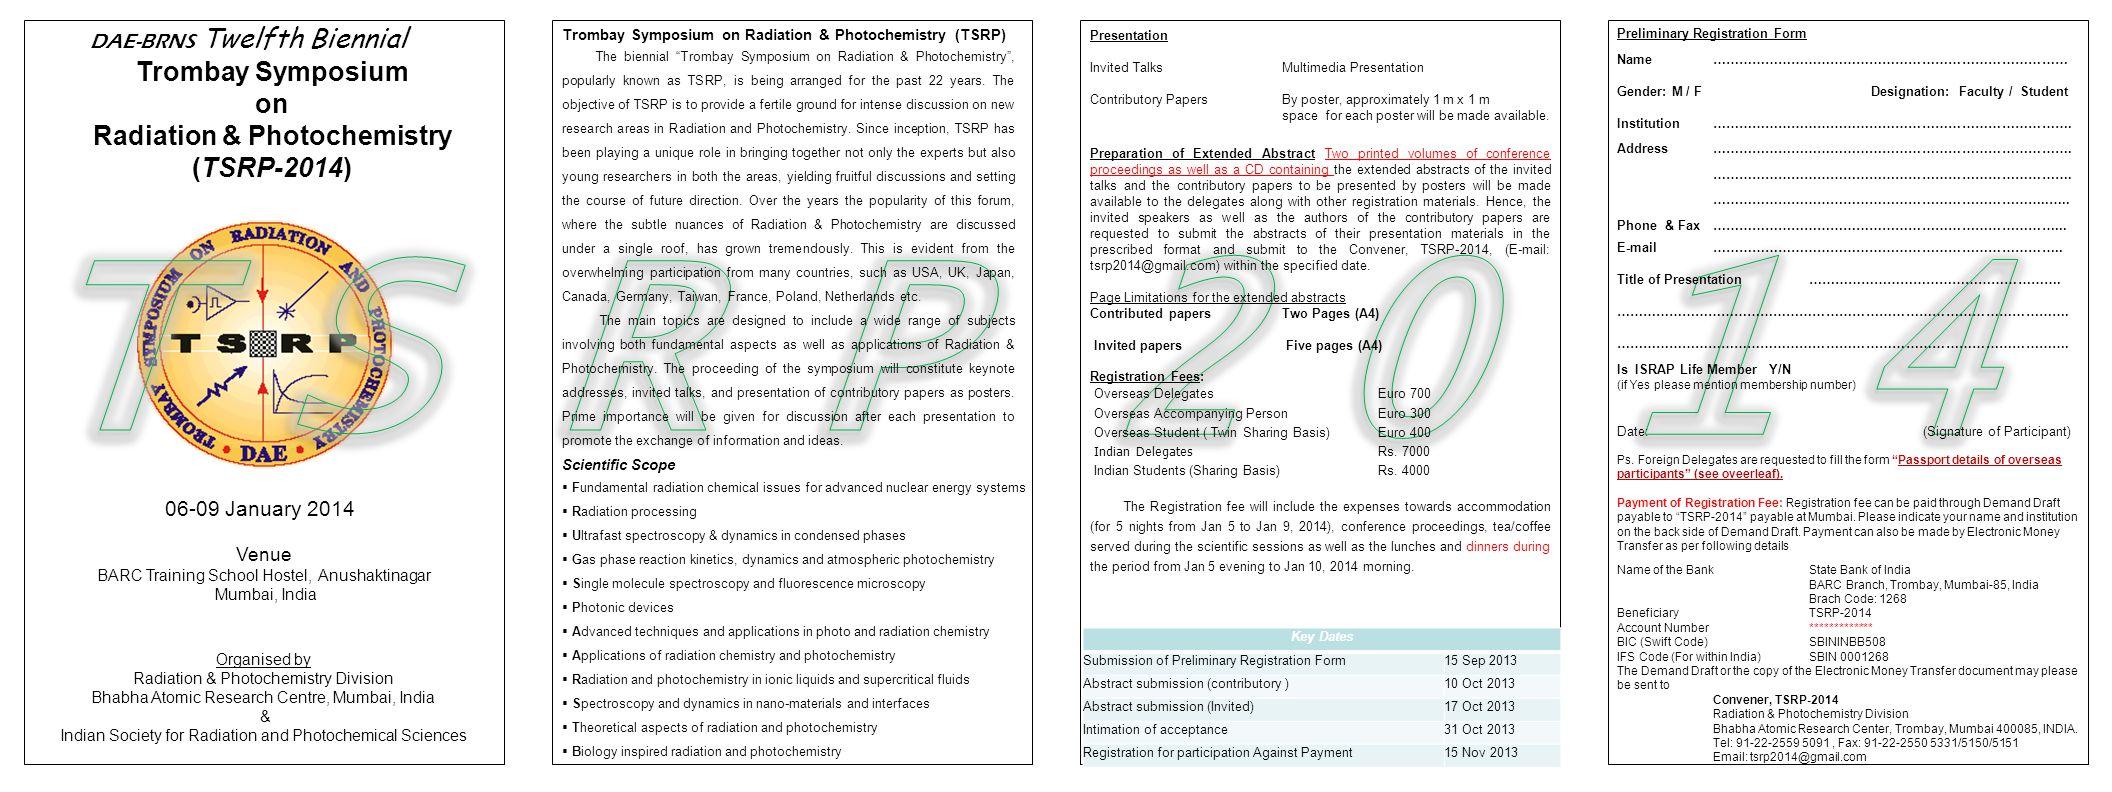 DAE-BRNS Twelfth Biennial Trombay Symposium on Radiation & Photochemistry (TSRP-2014) Organised by Radiation & Photochemistry Division Bhabha Atomic Research Centre, Mumbai, India & Indian Society for Radiation and Photochemical Sciences 06-09 January 2014 Venue BARC Training School Hostel, Anushaktinagar Mumbai, India Preliminary Registration Form Name ……………………………………………………………………… Gender: M / F Designation: Faculty / Student Institution ……………………………………………………………………….